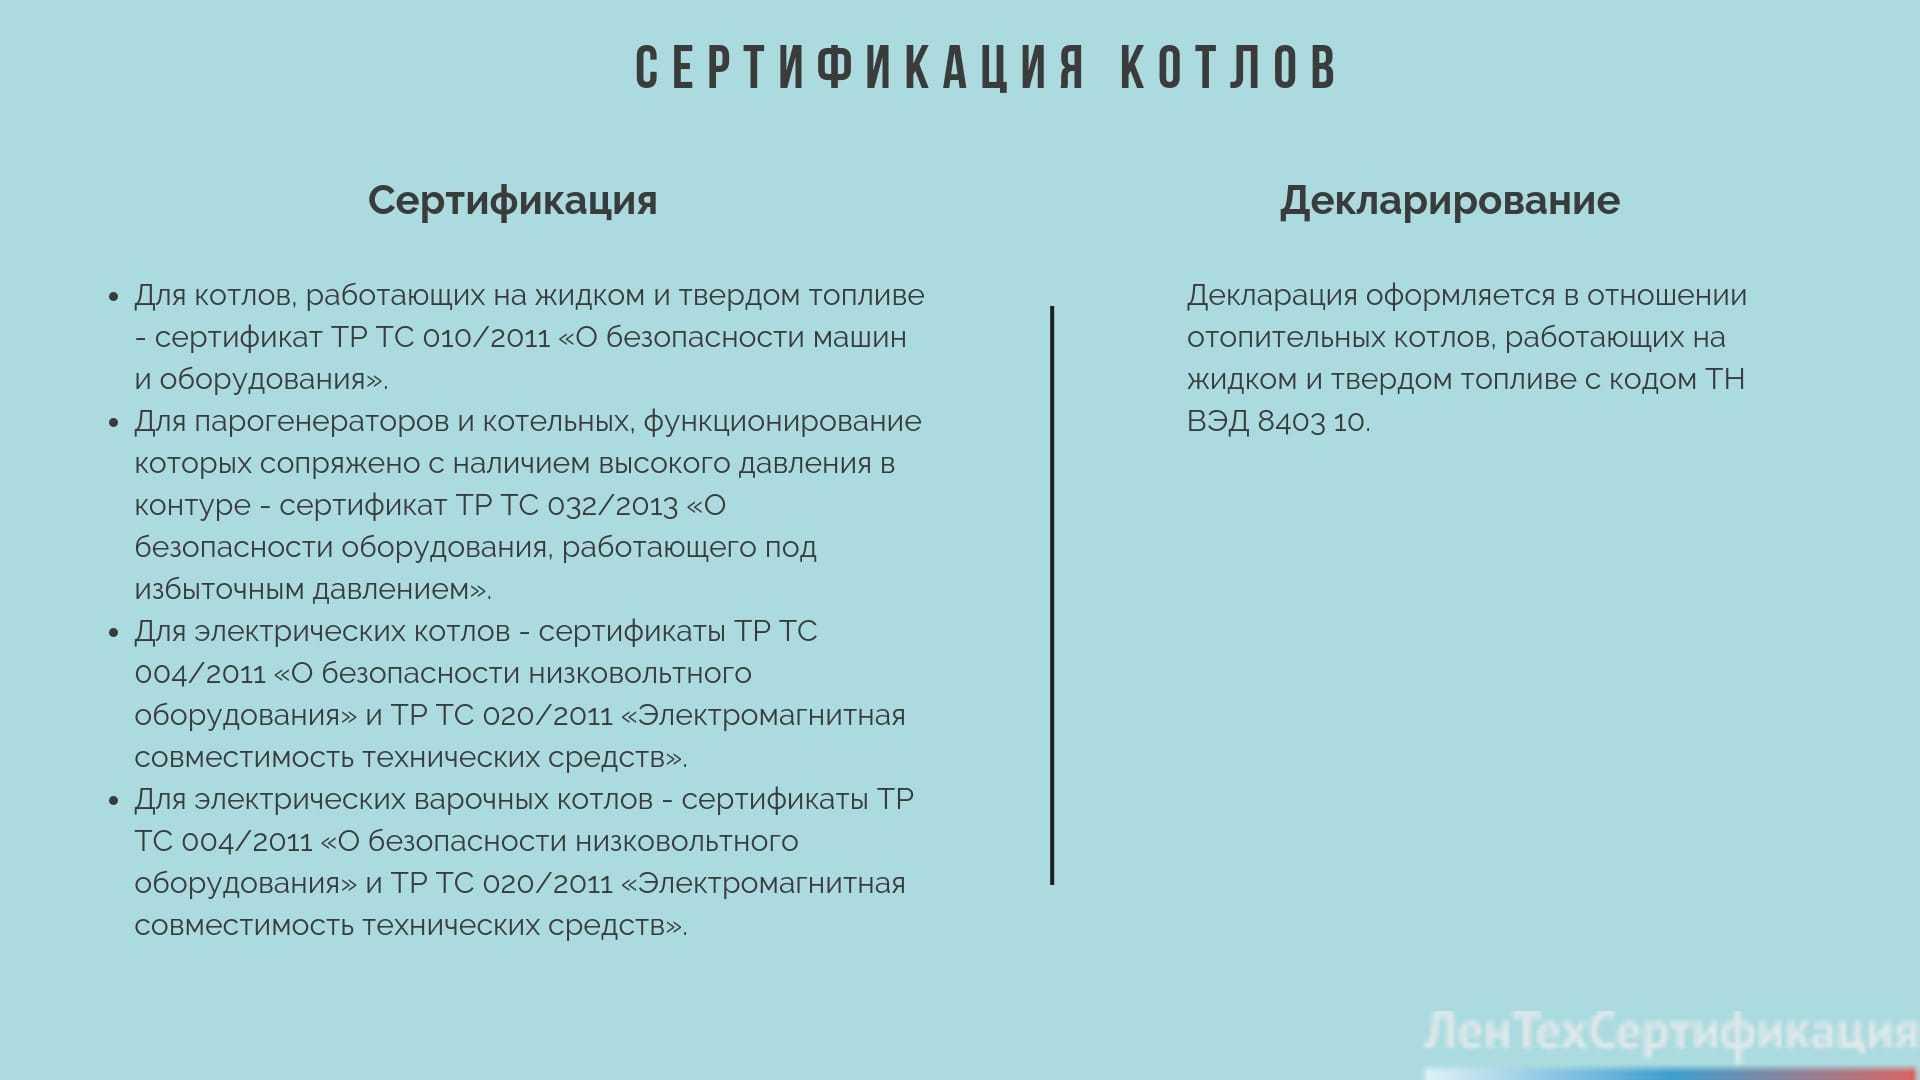 сертификат на котлы